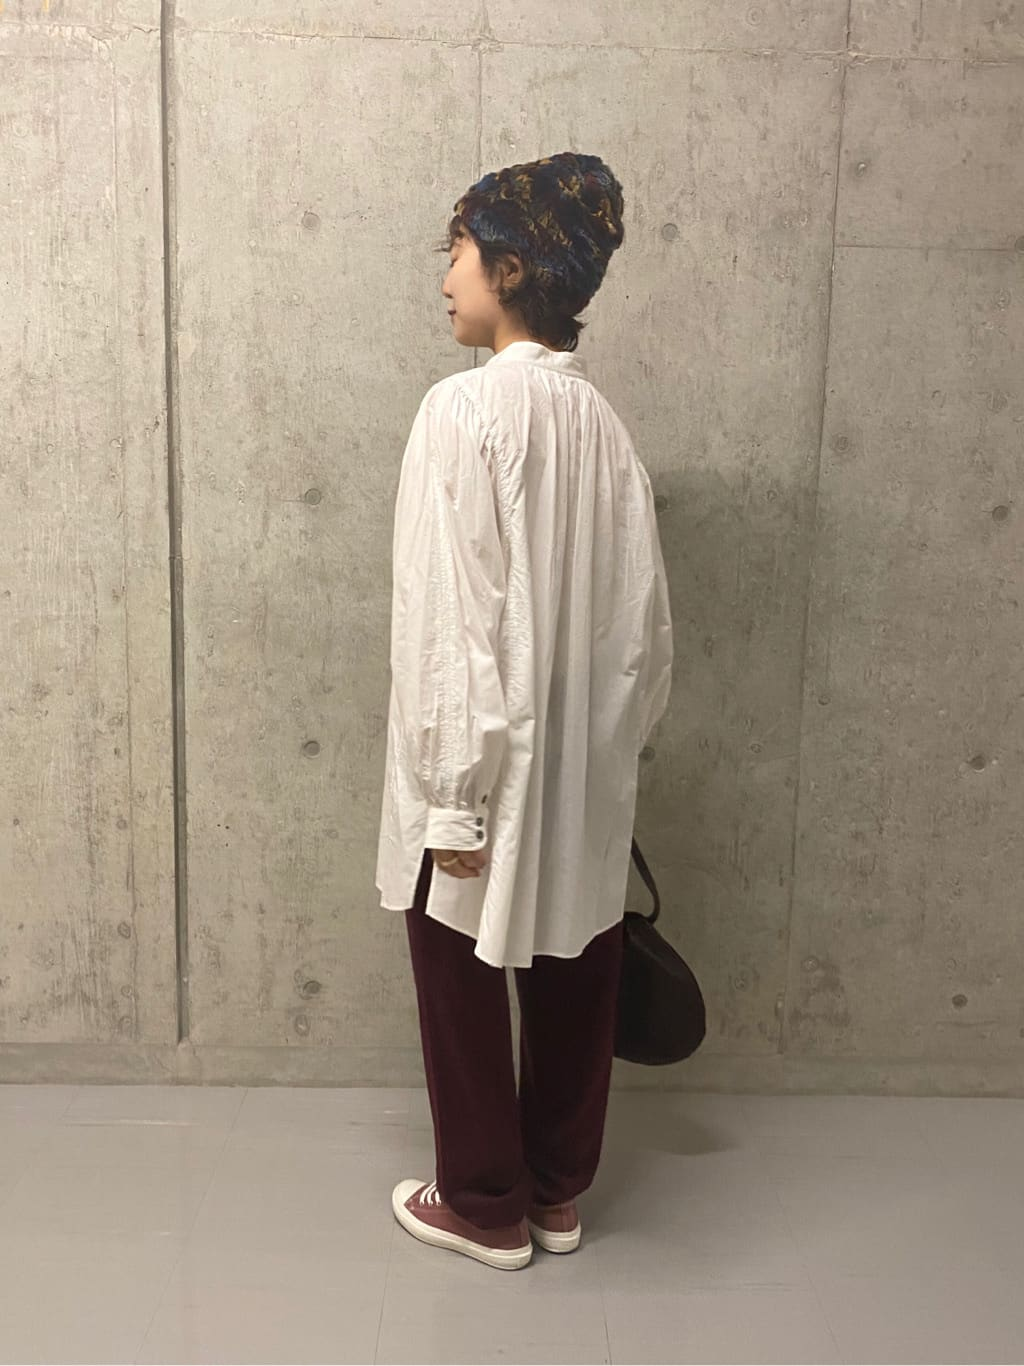 bulle de savon 阪急西宮ガーデンズ 身長:149cm 2021.09.03